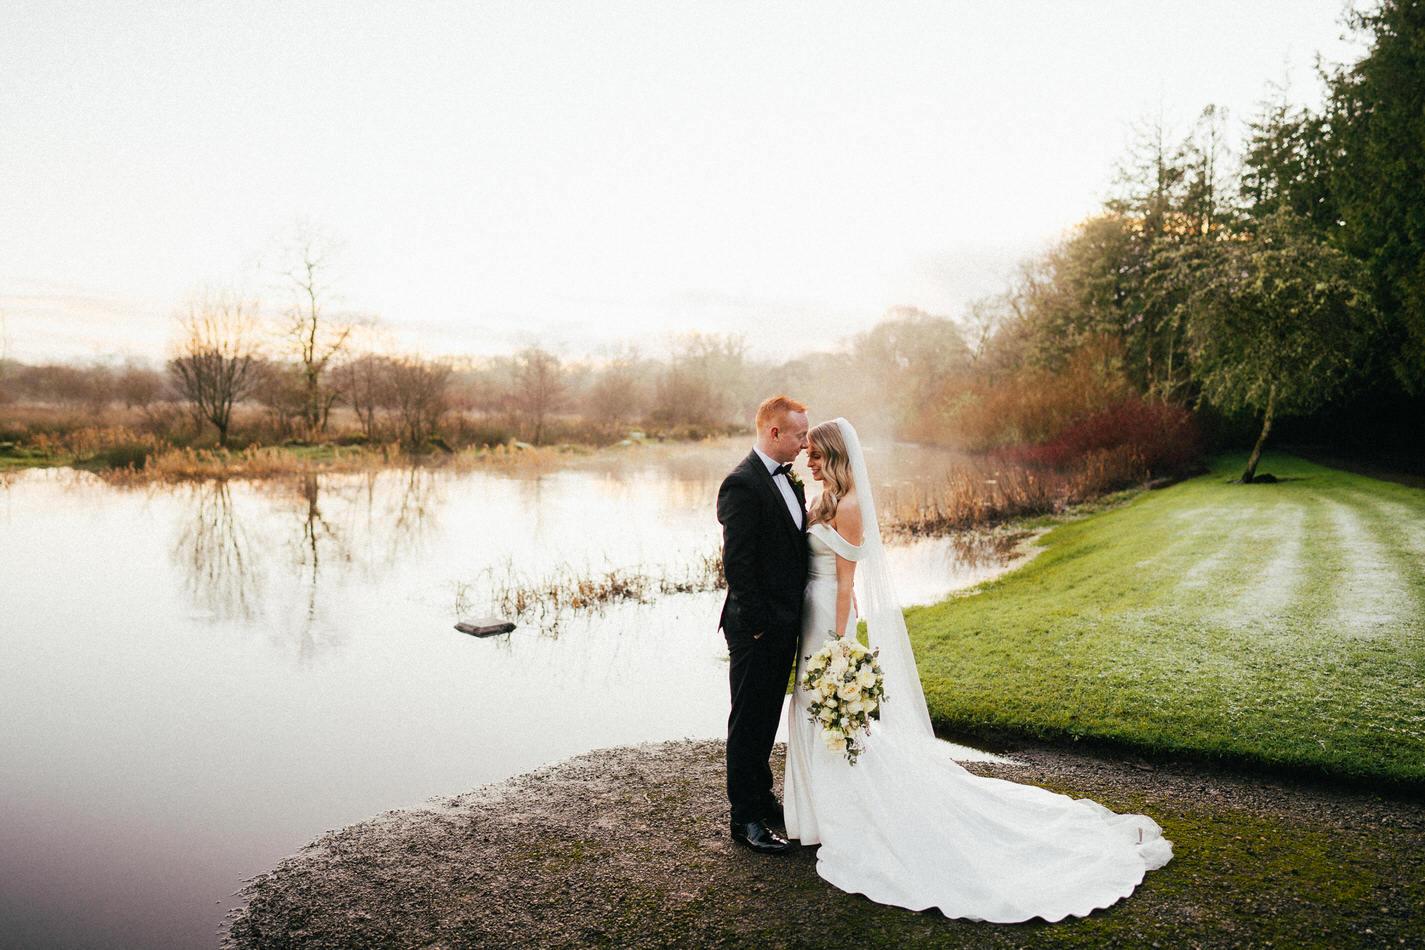 Castle-wedding-ireland-photos- 0221 161